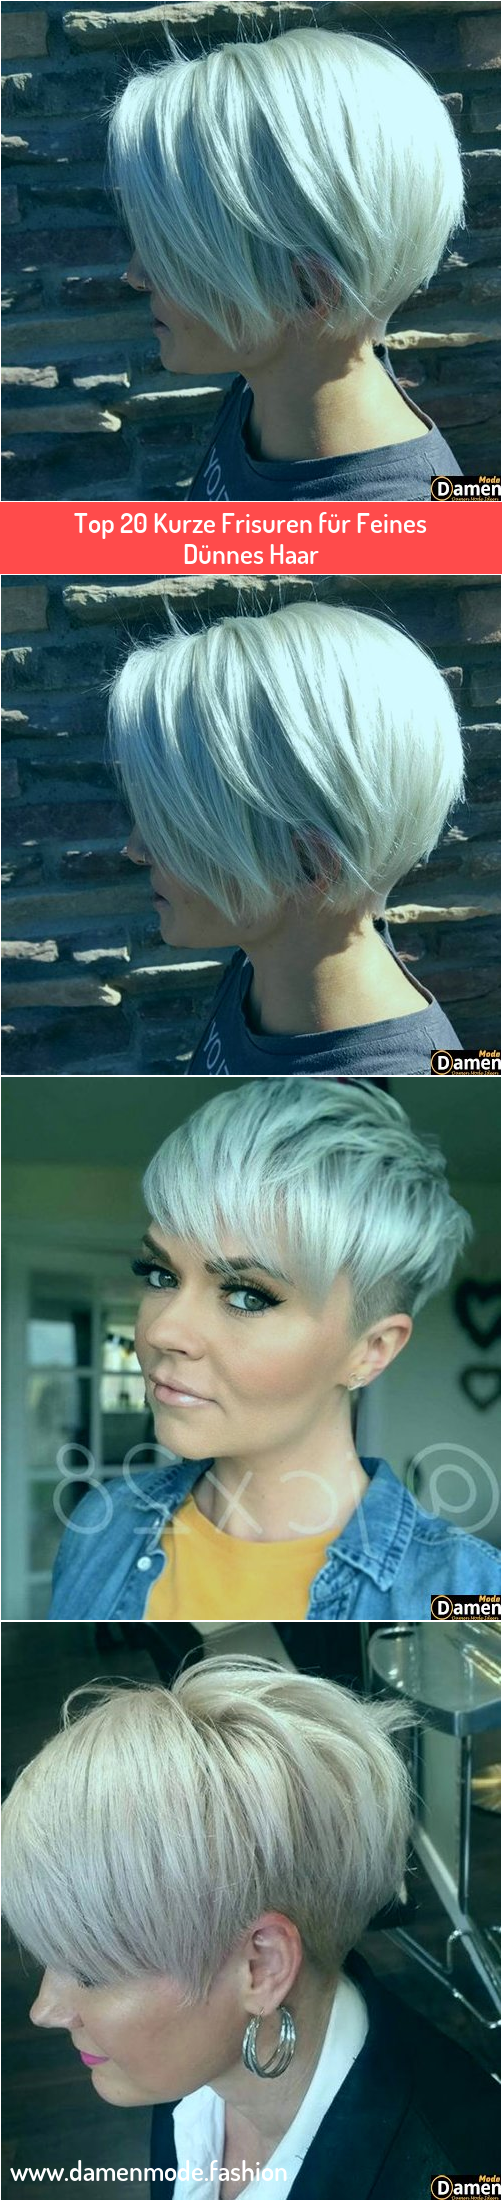 Photo of Top 20 Kurze Frisuren für Feines Dünnes Haar